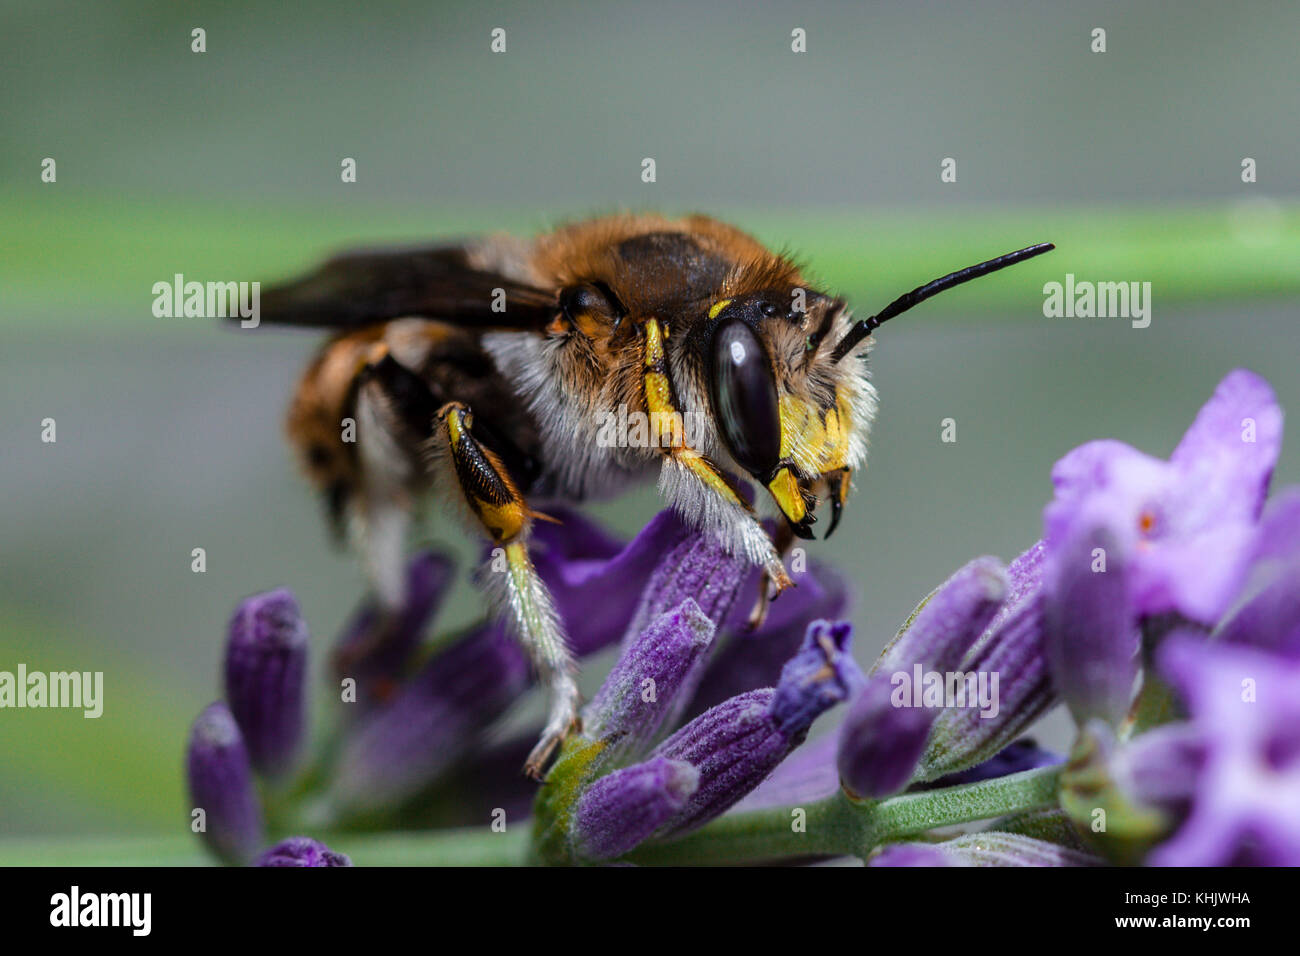 European Wool Carder Bee, Anthidium manicatum, Munich, Bavaria, Germany - Stock Image